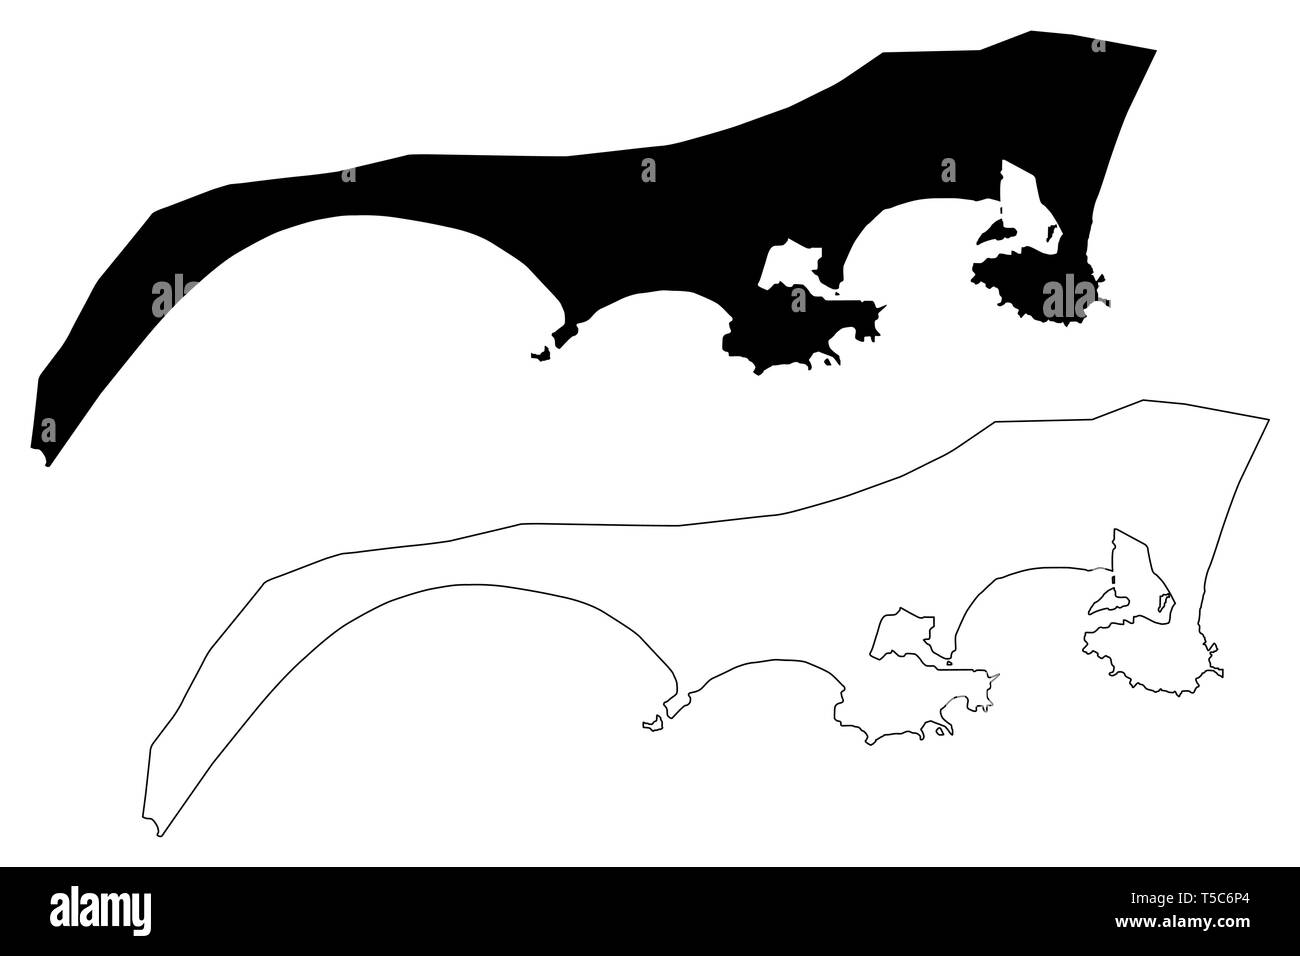 Aden Governorate (Governorates of Yemen, Republic of Yemen) map vector illustration, scribble sketch Aden map - Stock Vector